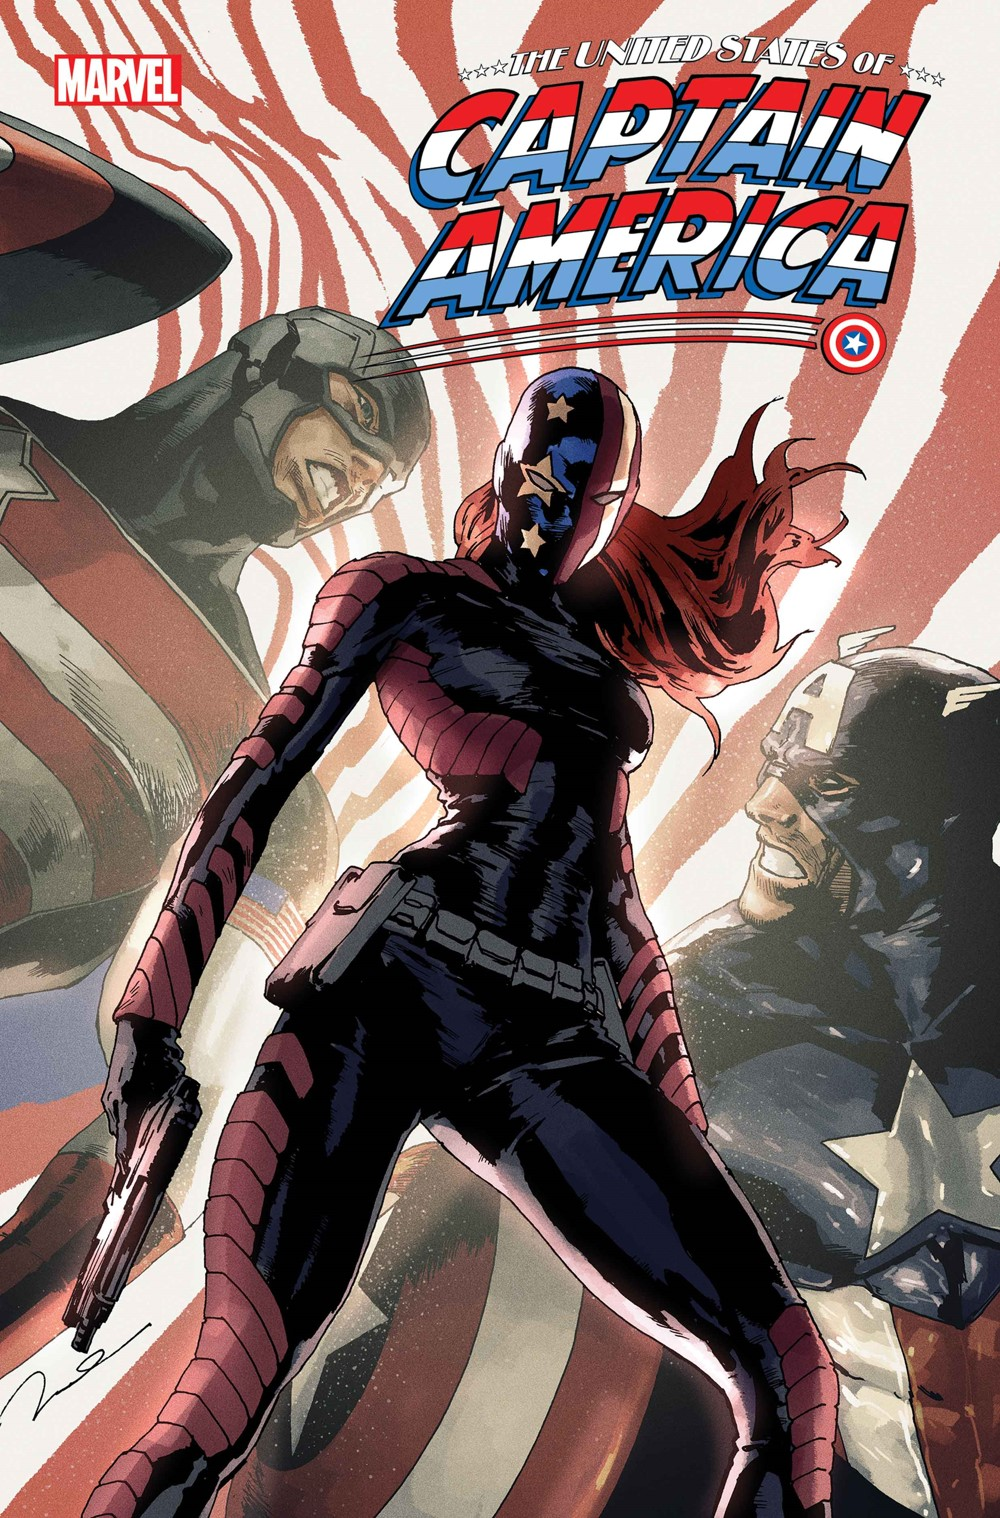 USCAPA2021004_Cov-1 Marvel Comics September 2021 Solicitations